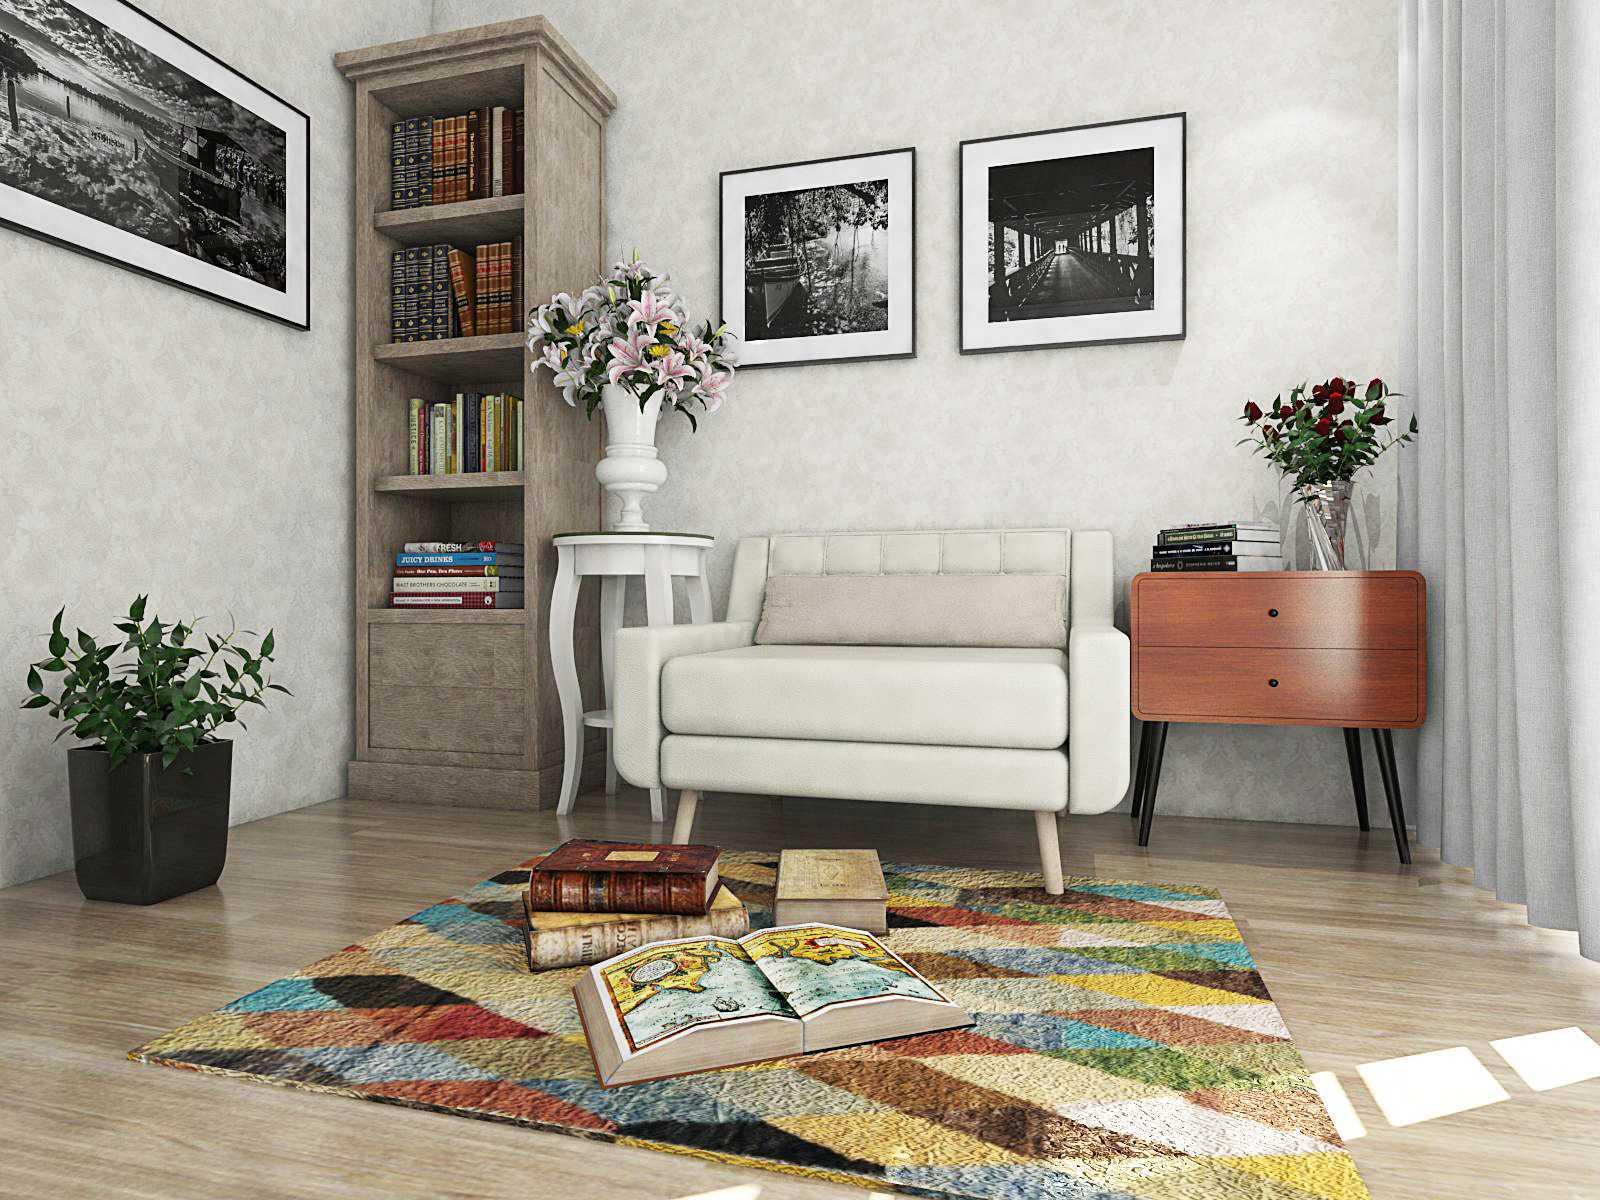 Caesar® | Development & Studio Shabby Chic - Farm House ,home Design Bandung, Kota Bandung, Jawa Barat, Indonesia Bandung, Kota Bandung, Jawa Barat, Indonesia Caesar-Development-Studio-Shabby-Chic-Farm-House-Home-Design  67156